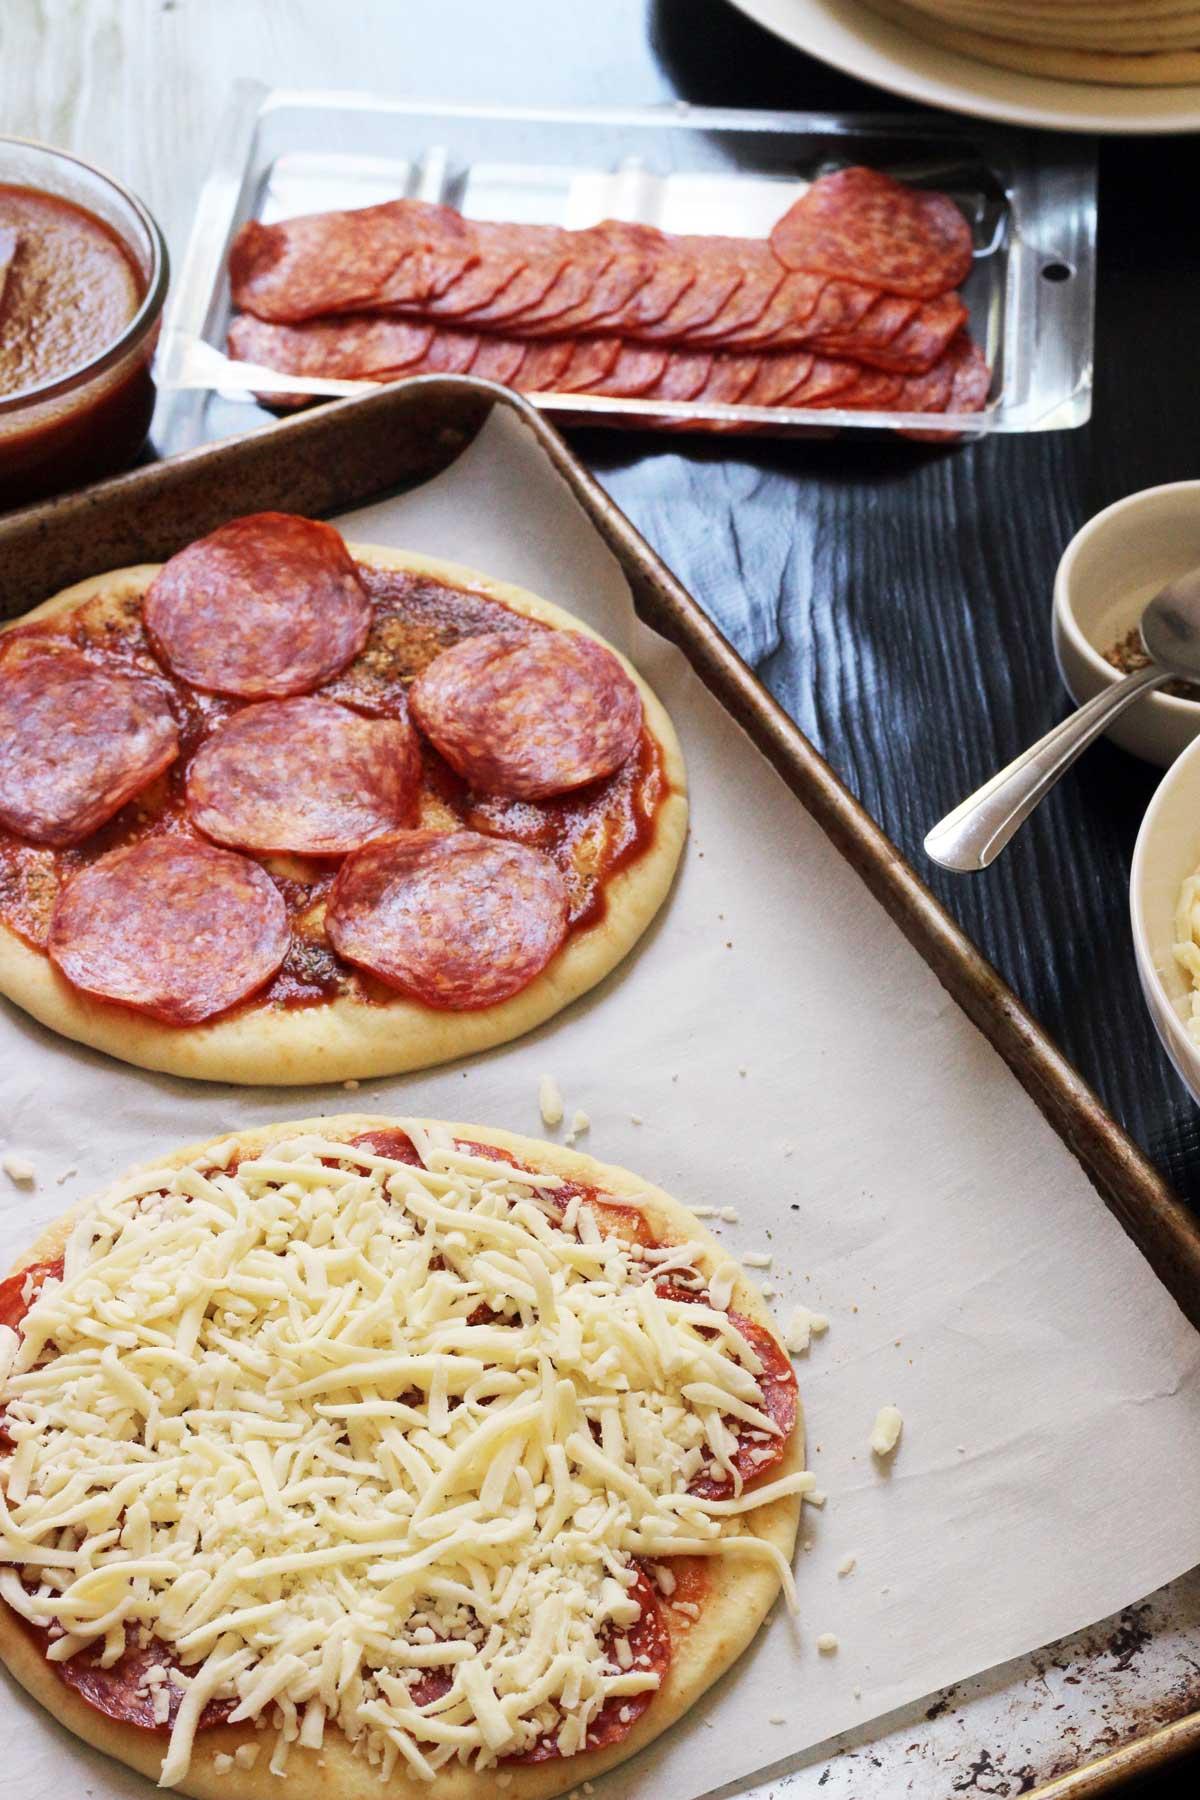 assembling pita bread pizzas on tray